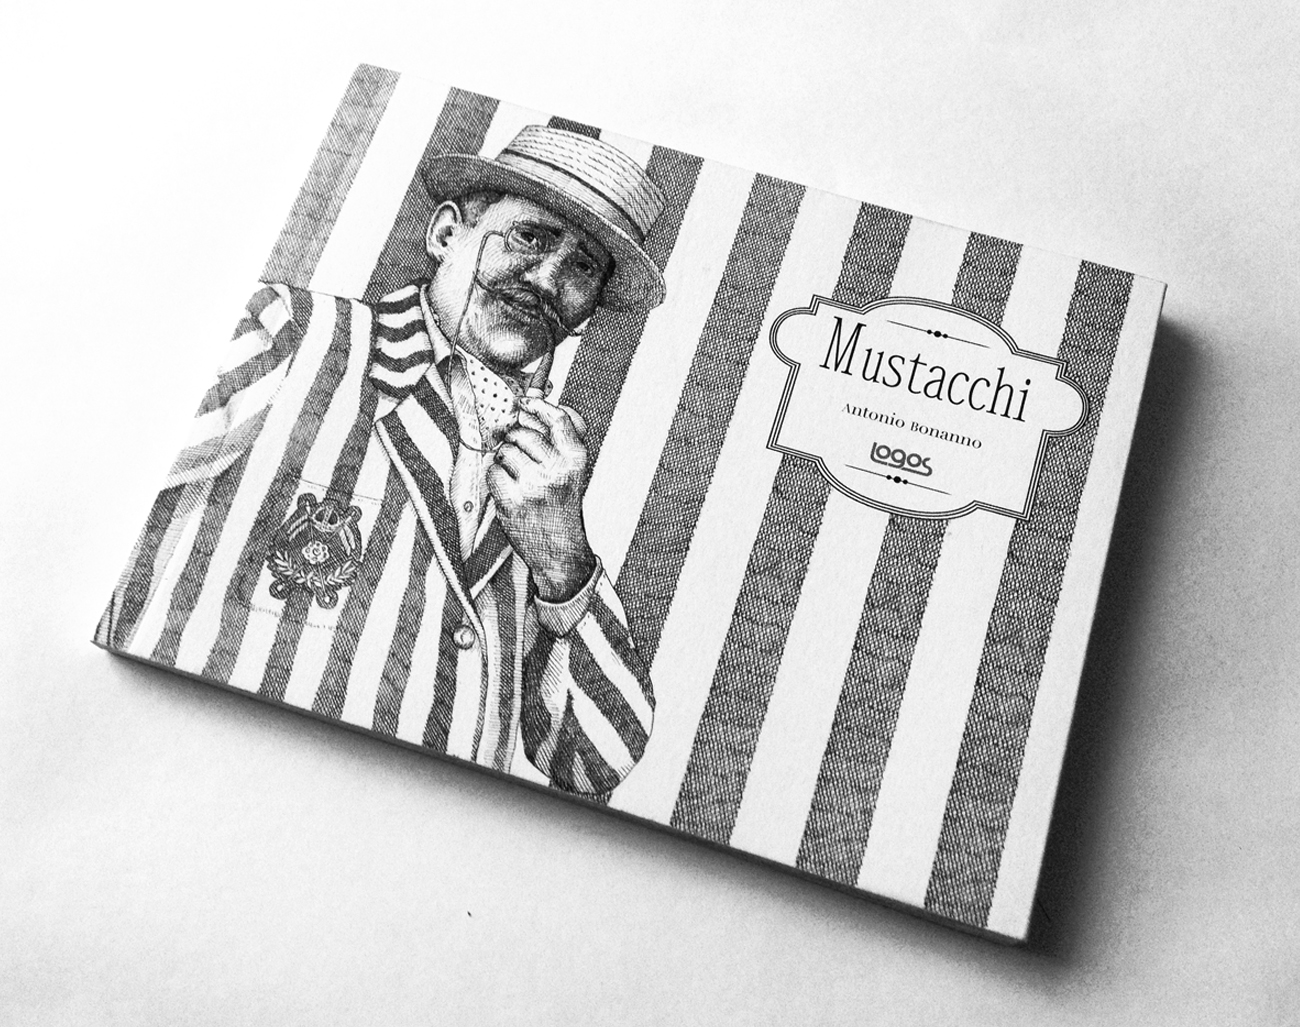 MustacchiBook